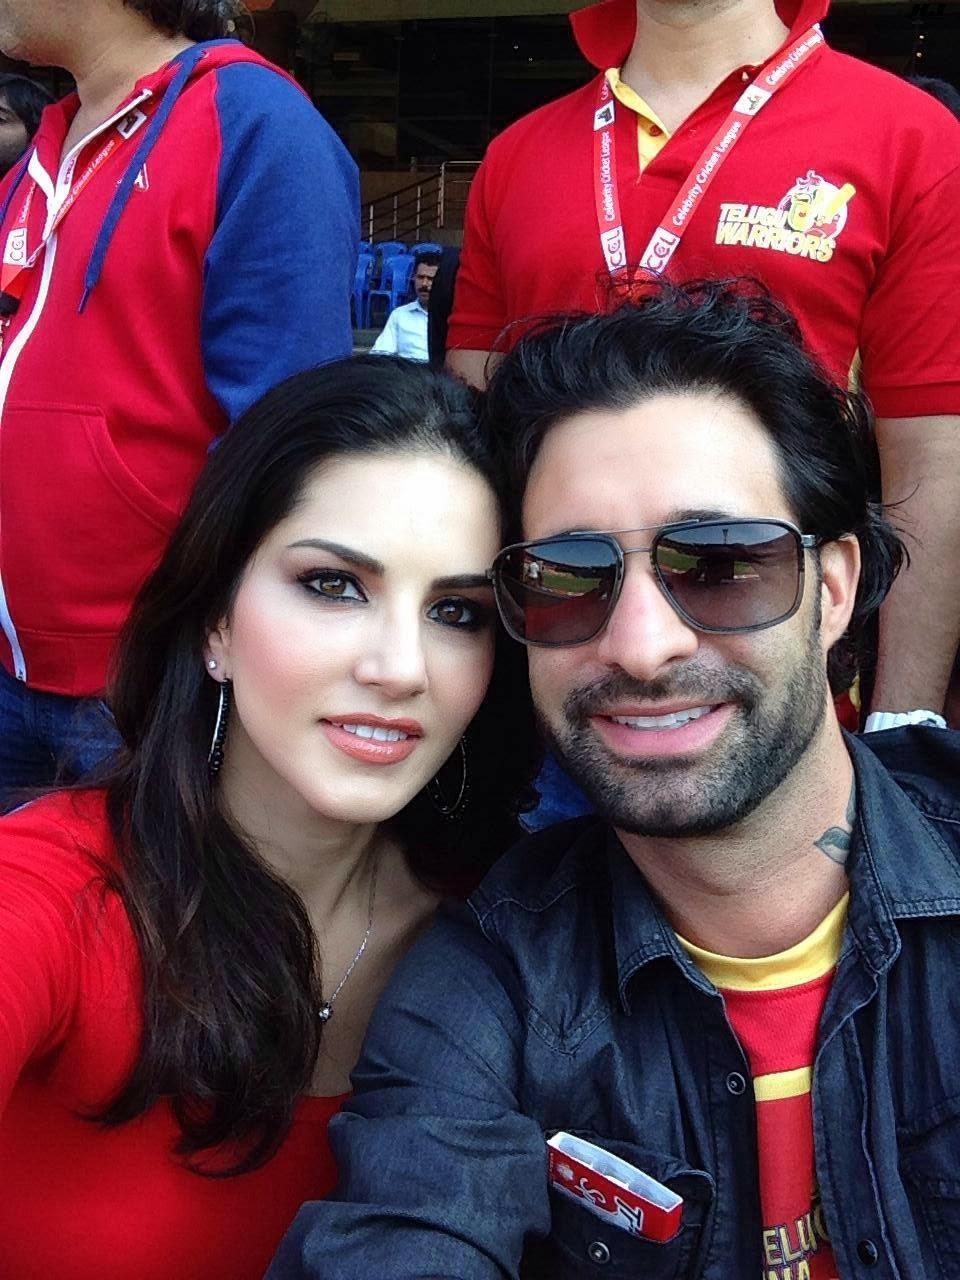 Sunny Leone Hot Photoshots With Her Husband - Hot Images-9082